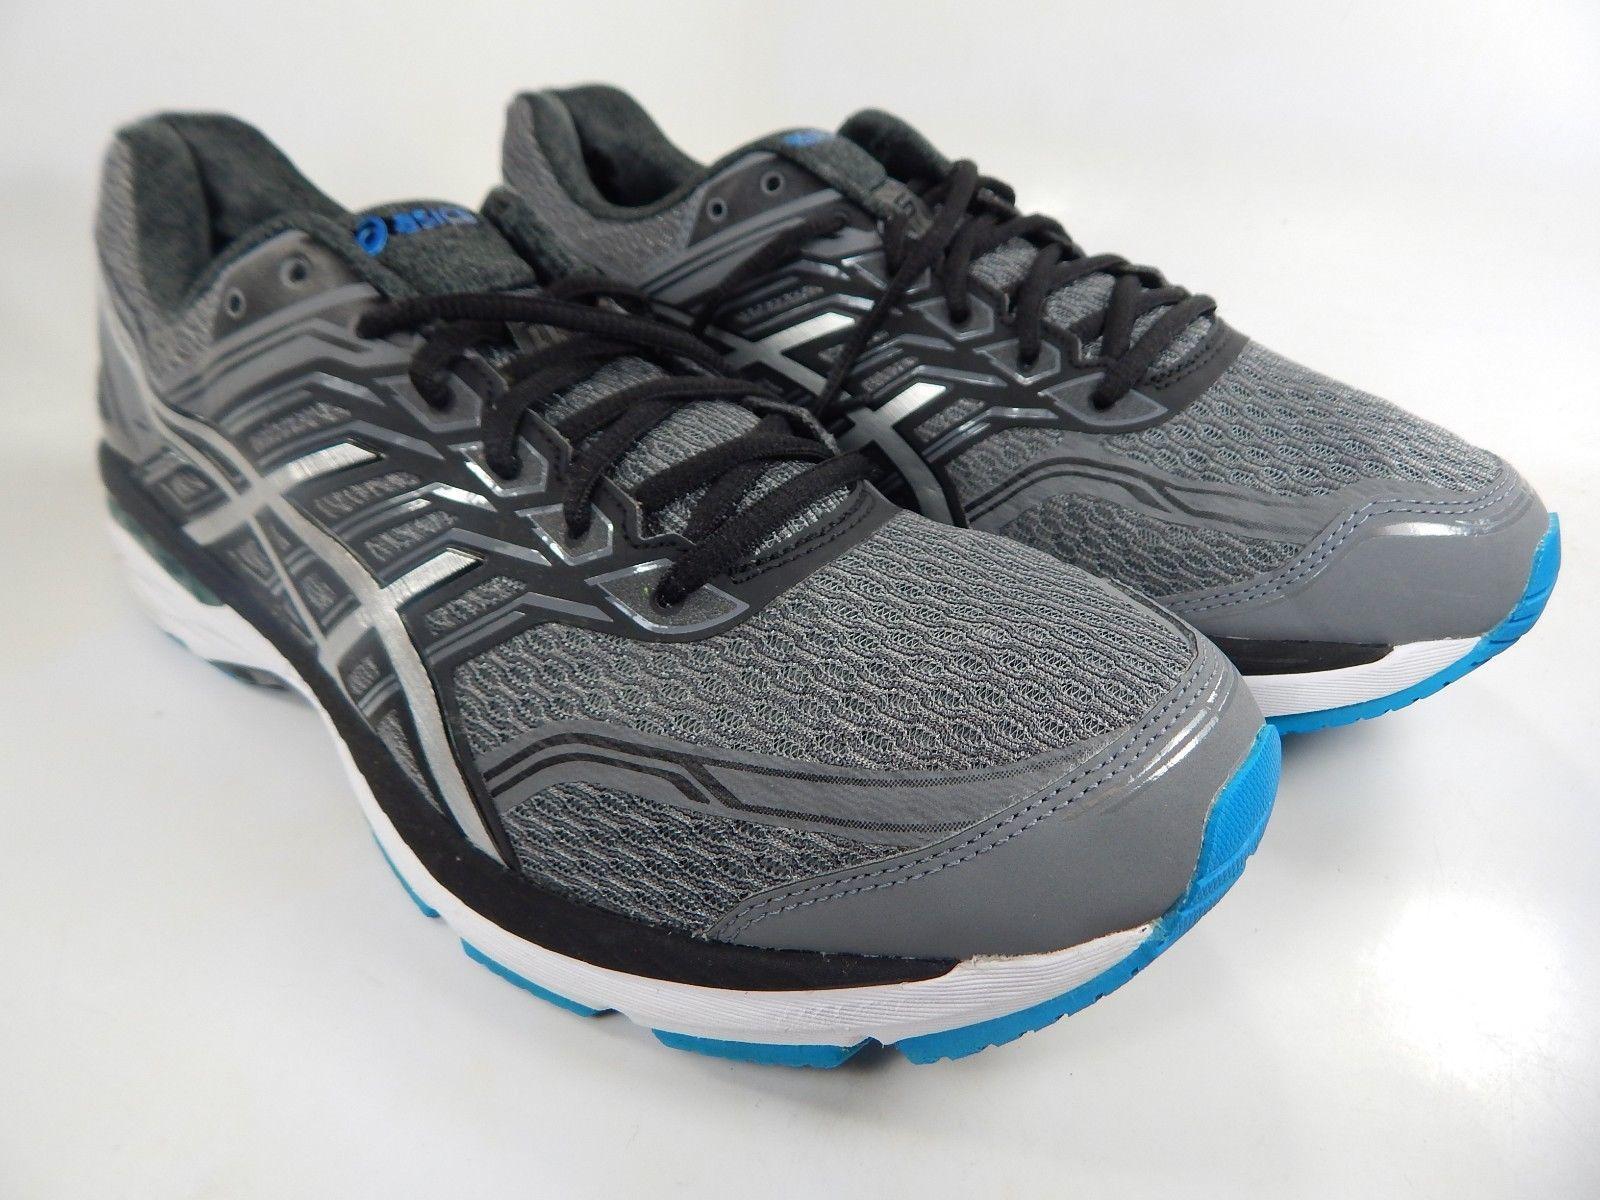 Asics GT 2000 v 5 Size US 12.5 M (D) EU 47 Men's Running Shoes Gray T707N